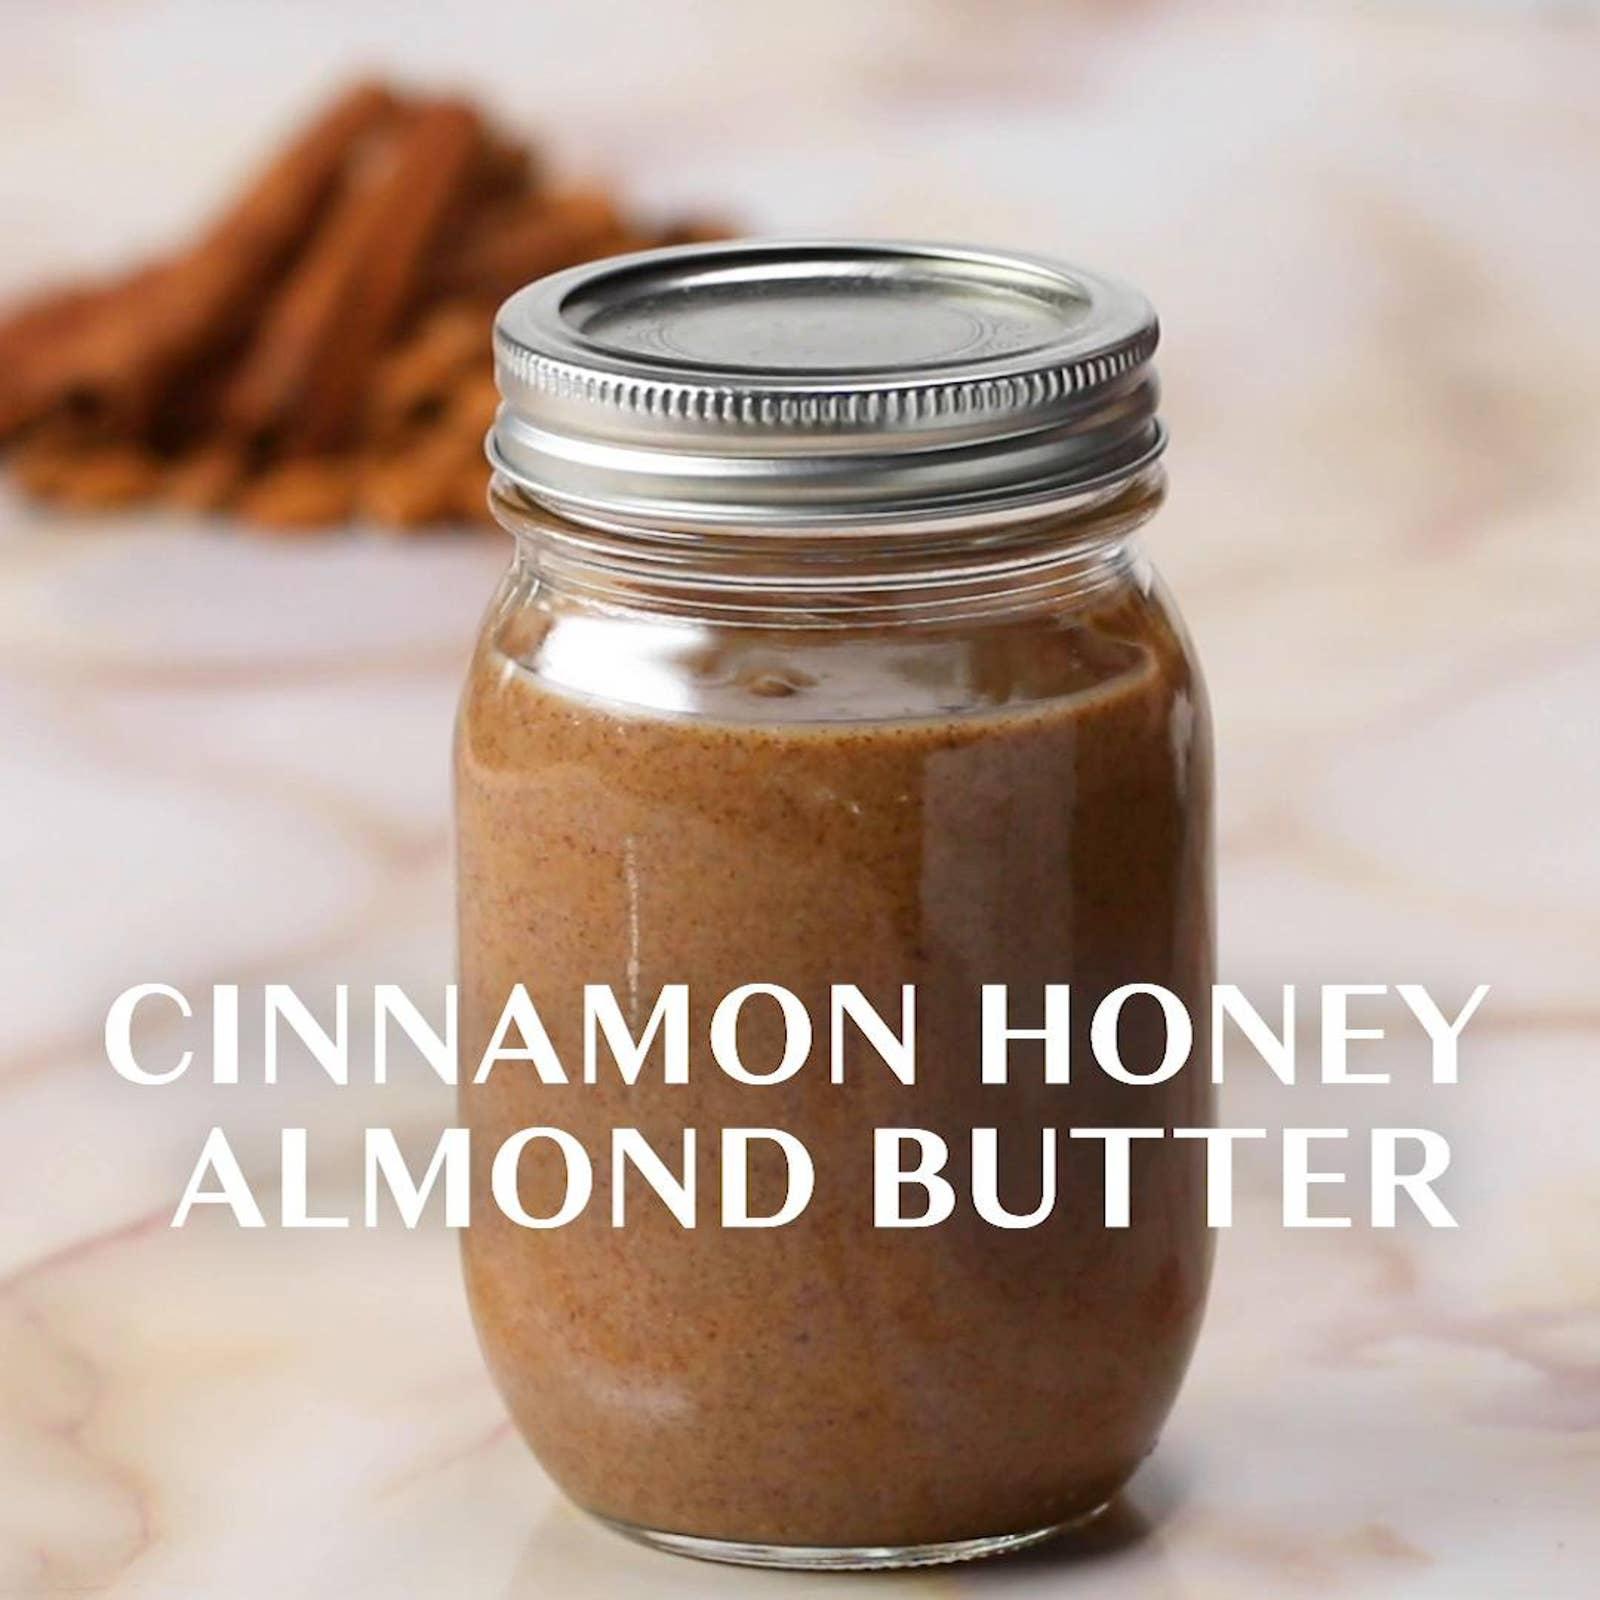 Cinnamon Honey Almond Butter